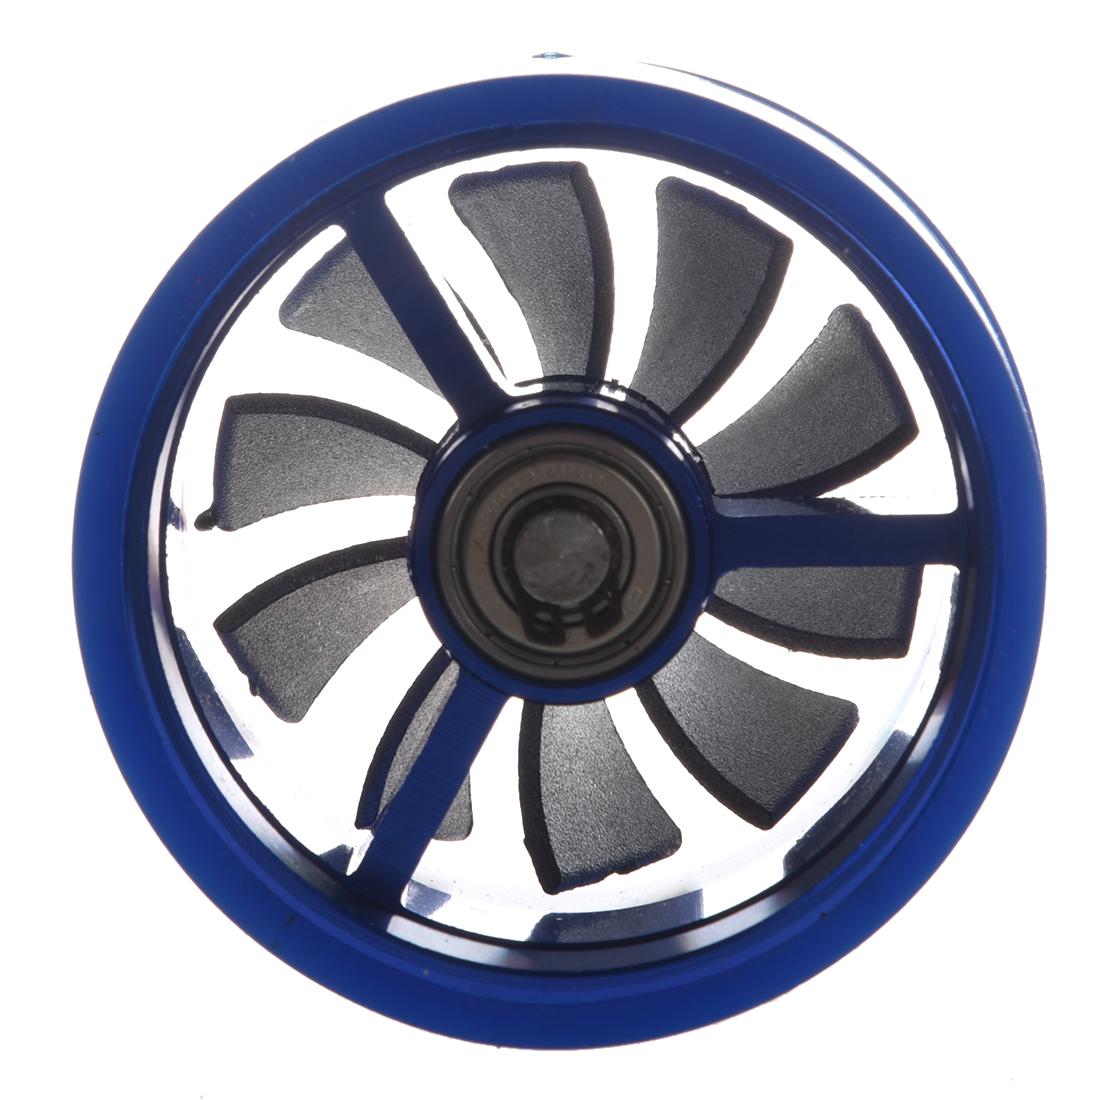 turbo lueftereinlass kraftstoff sparen ventilator blau. Black Bedroom Furniture Sets. Home Design Ideas